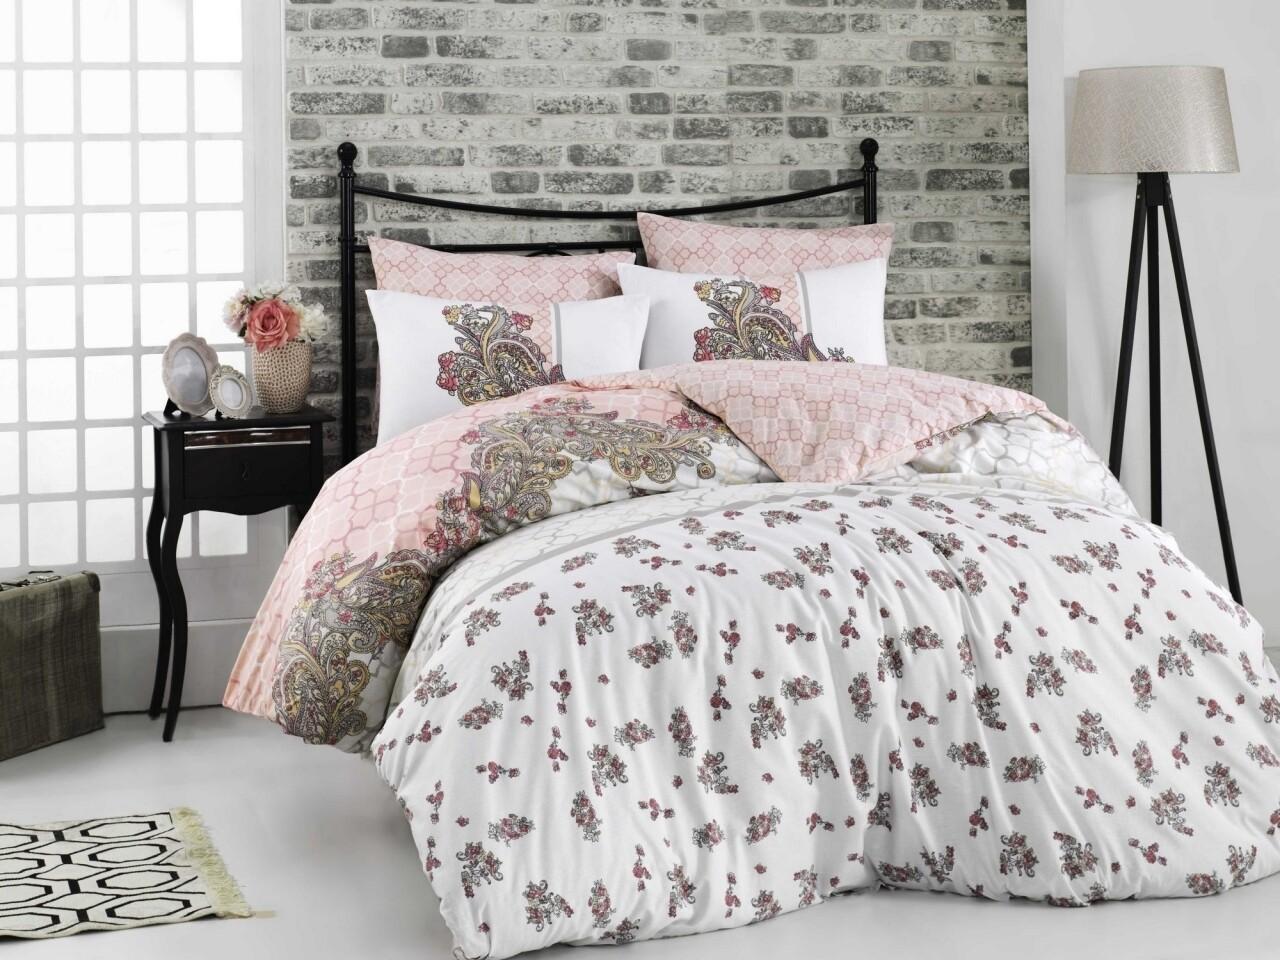 Lenjerie de pat pentru o persoana, 3 piese, 100% bumbac ranforce, Hobby, Emiliana, alb/roz